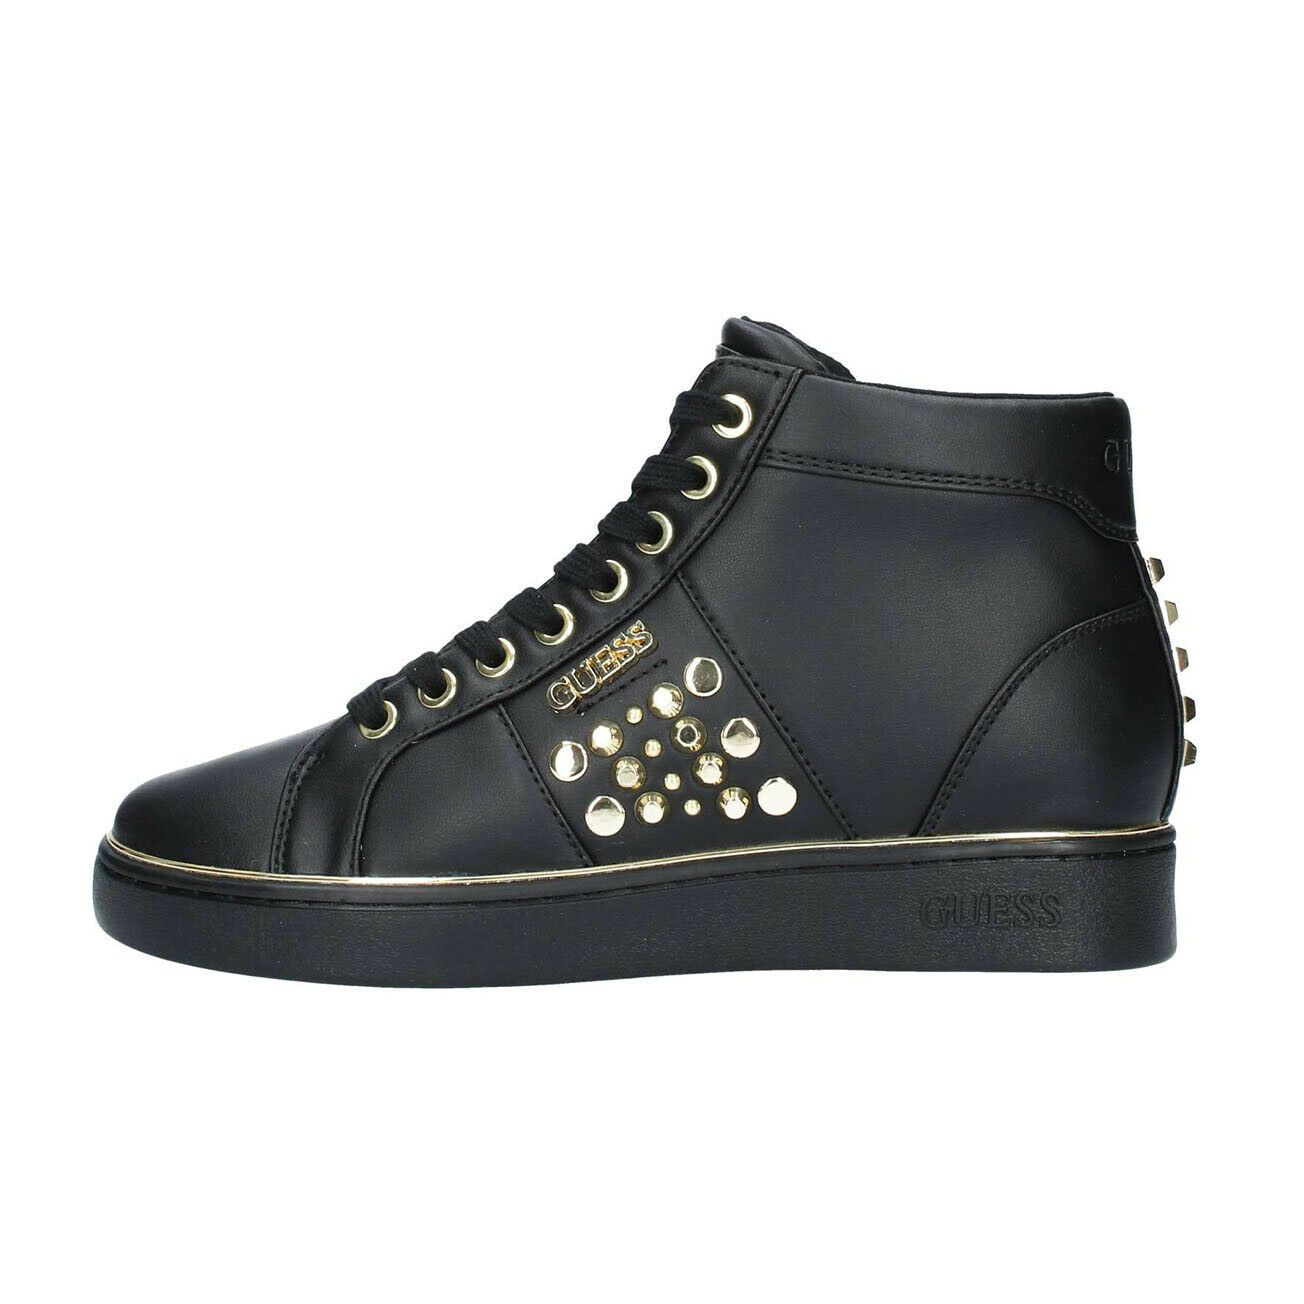 adidas donna scarpe allstar